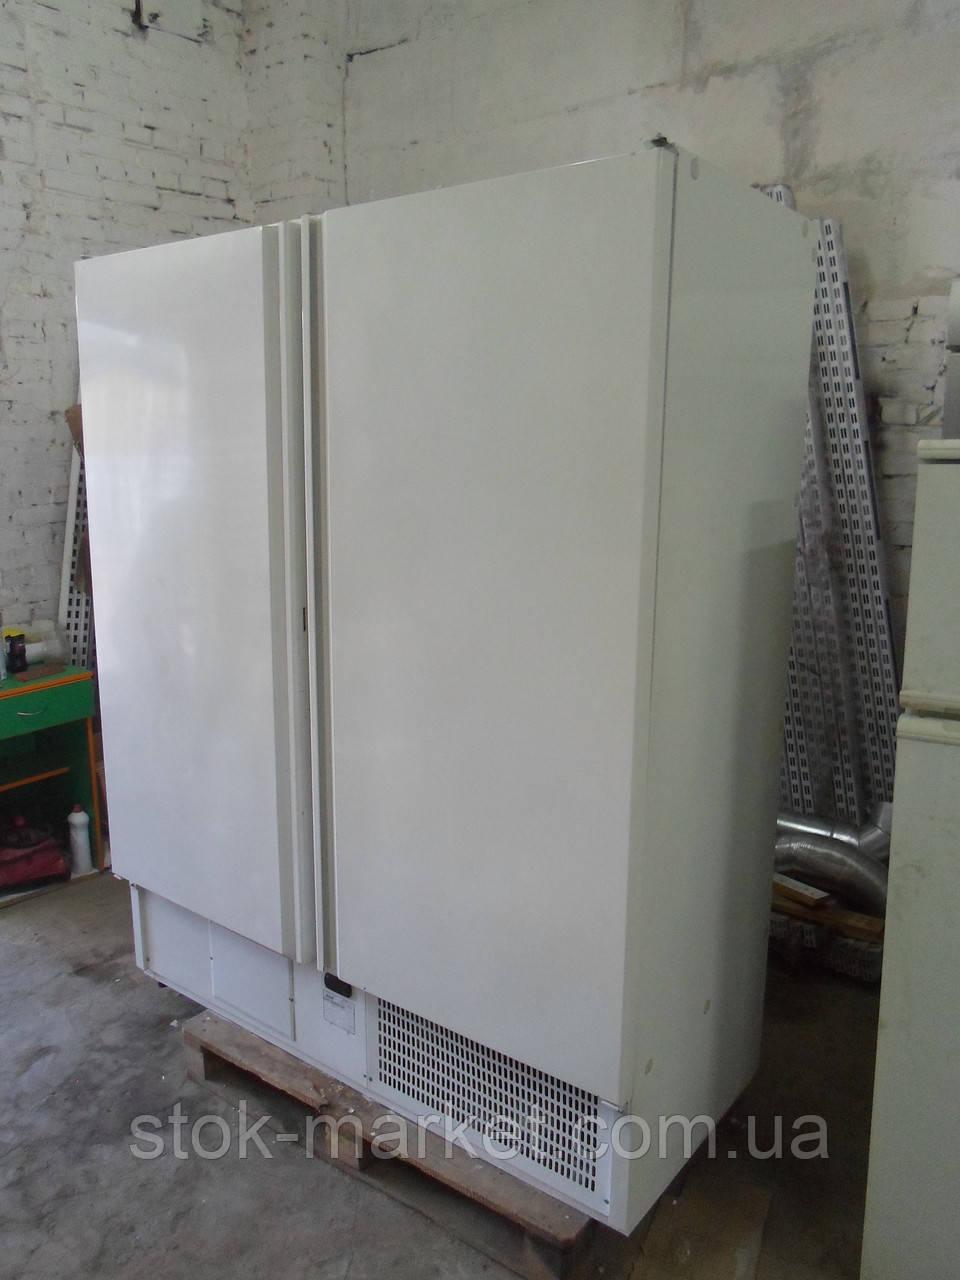 Холодильный шкаф Mawi 1400 Л. б/у, Холодильный шкаф б/у, камере холодильная б у.